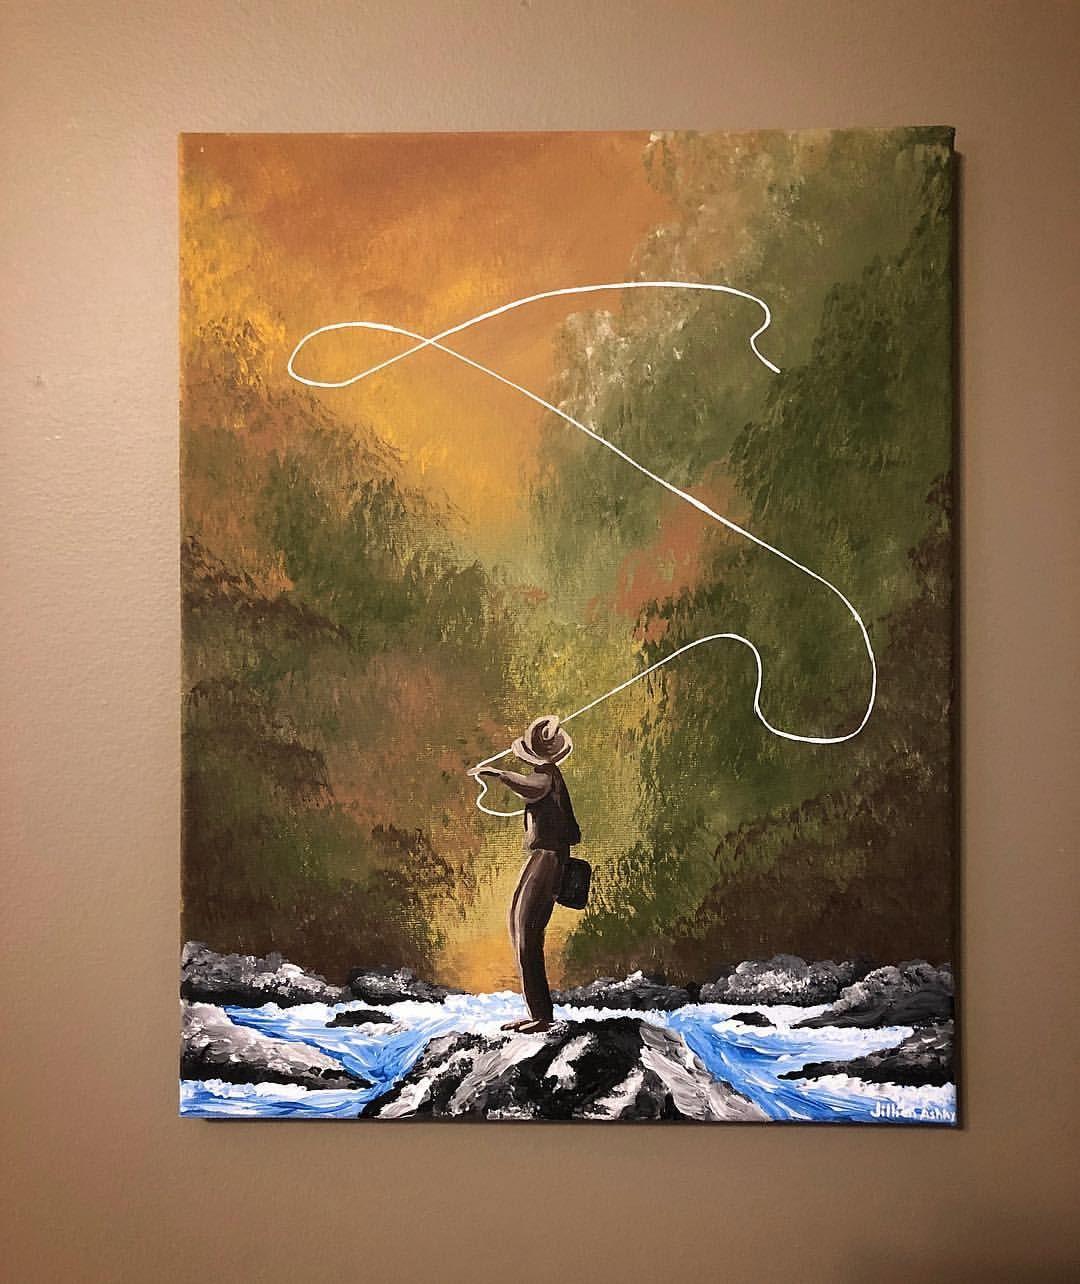 Fly Fishing 8x10 Lake Art Painting Fisherman Saltwater Christmas Present Fish Freshwater 11x14 Print STRIPED BASS Fishing